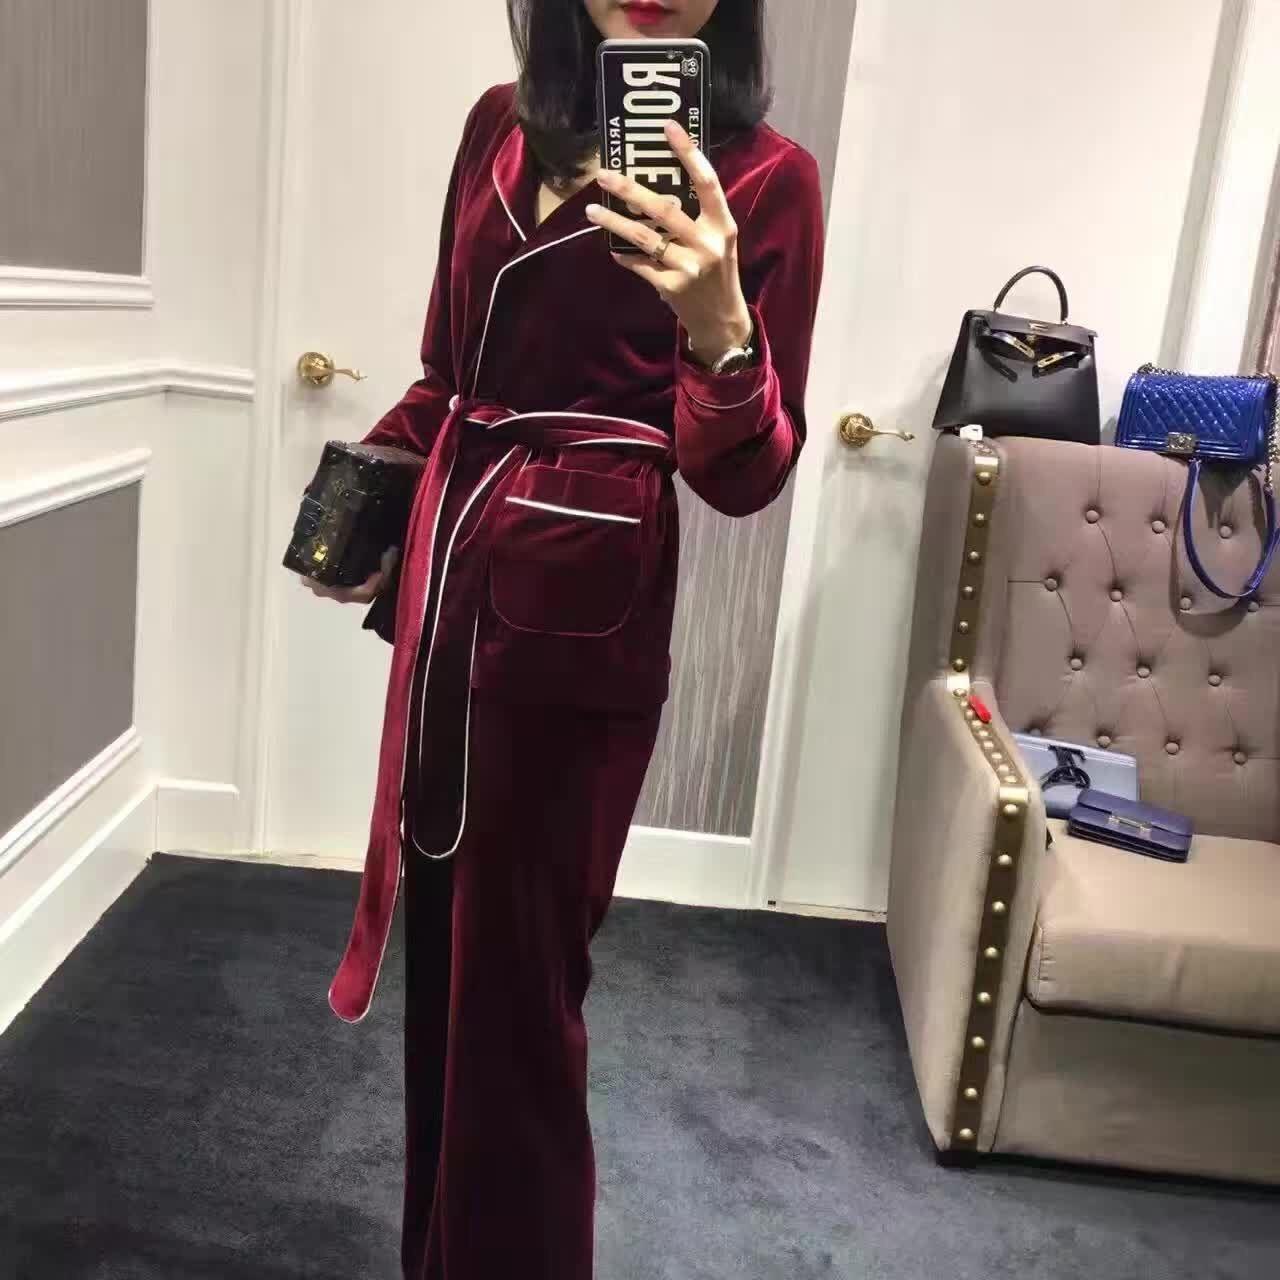 Grosshandel Neue Herbst Designer Mode Frauen Bademantel Stil